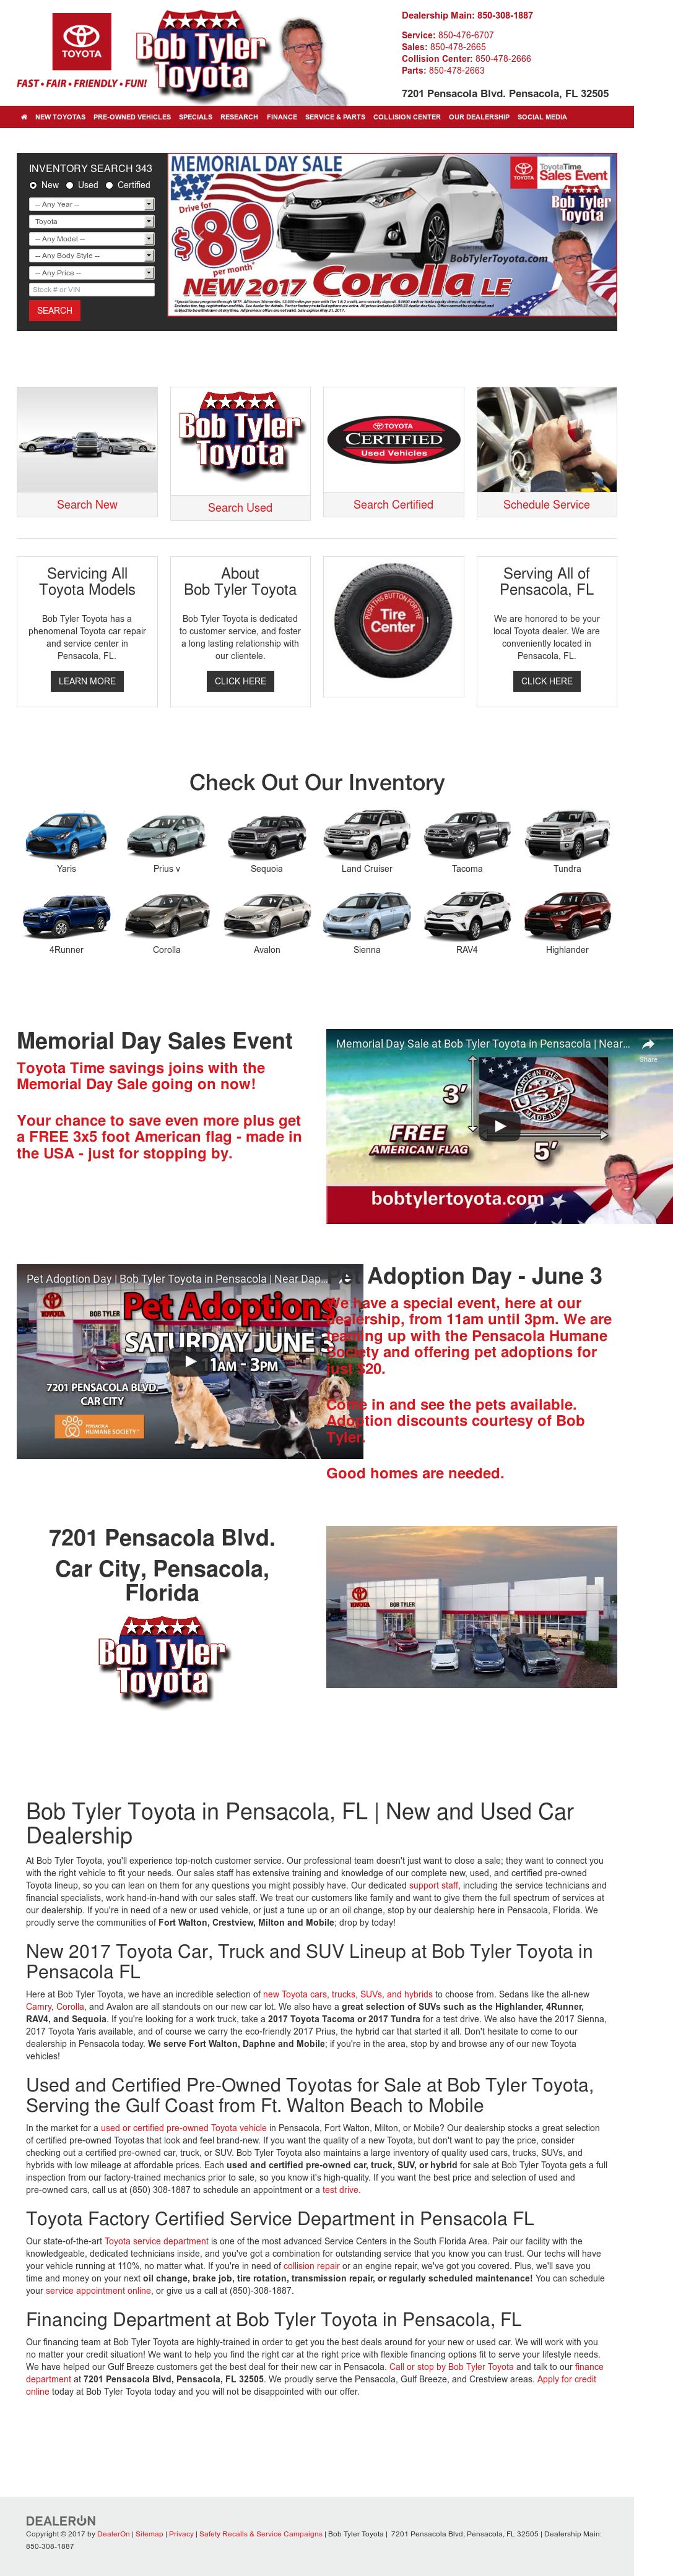 Bob Tyler Toyota Website History